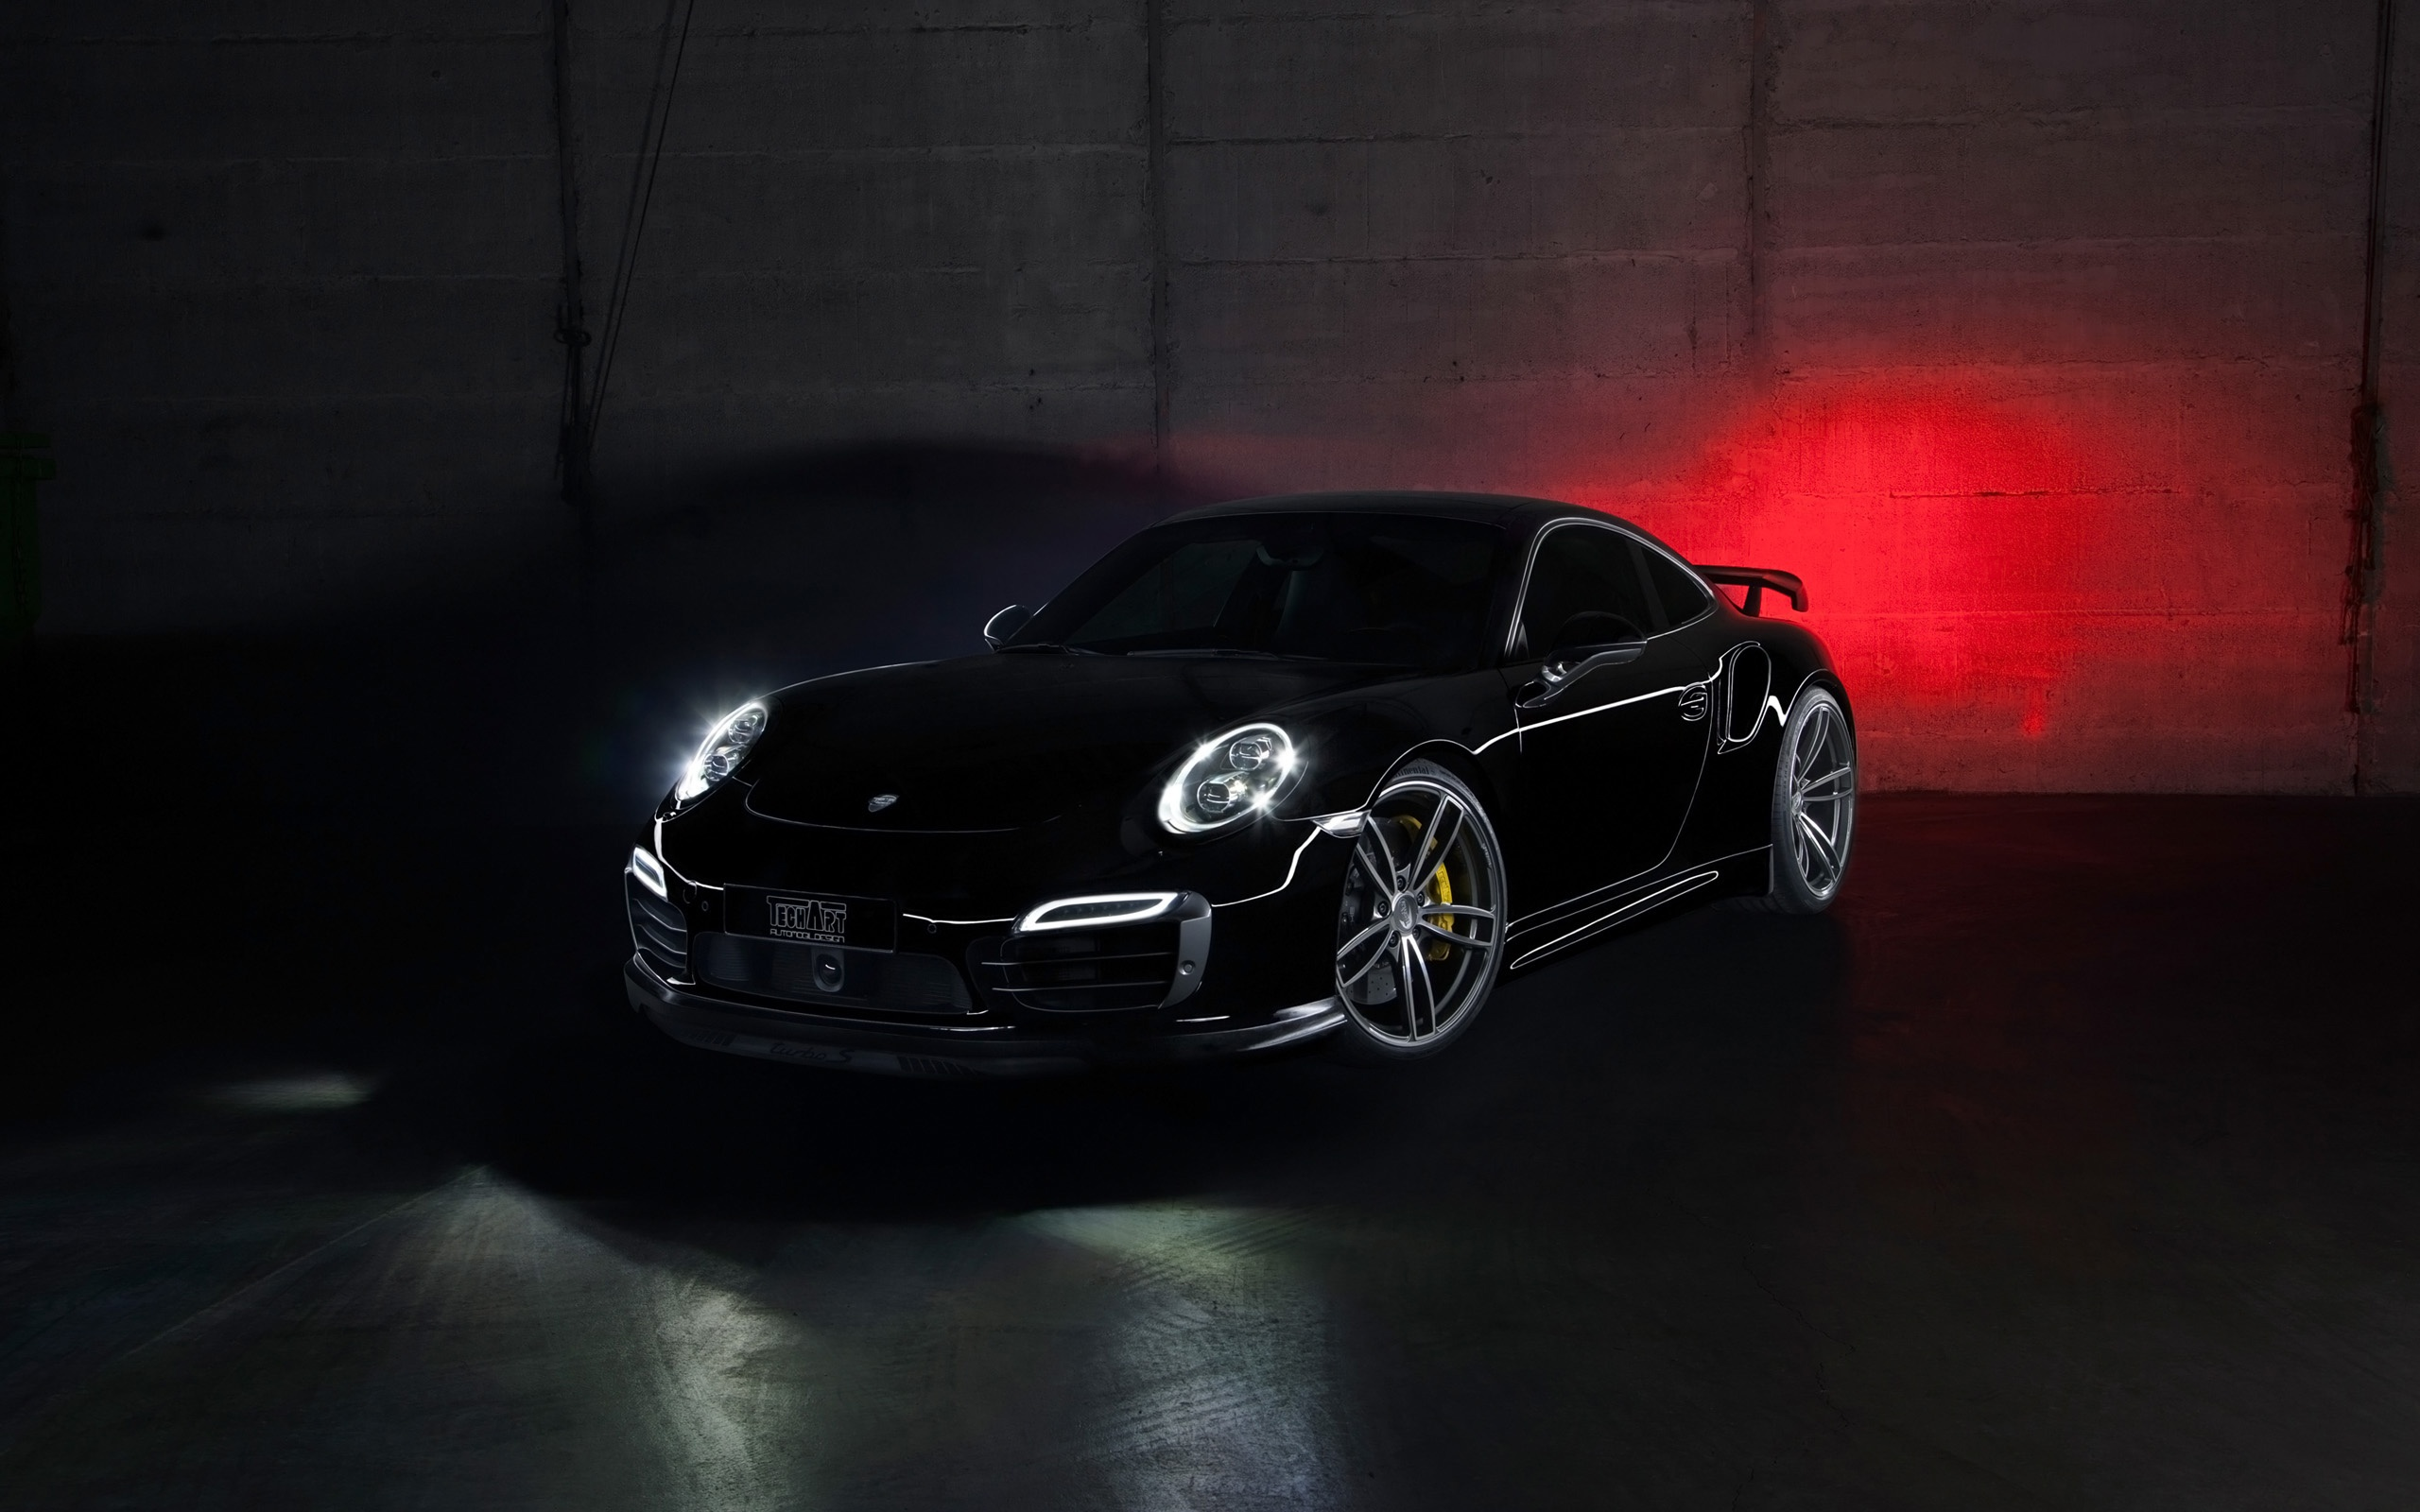 Techart Porsche 911 Turbo Wallpapers In Jpg Format For Free Download